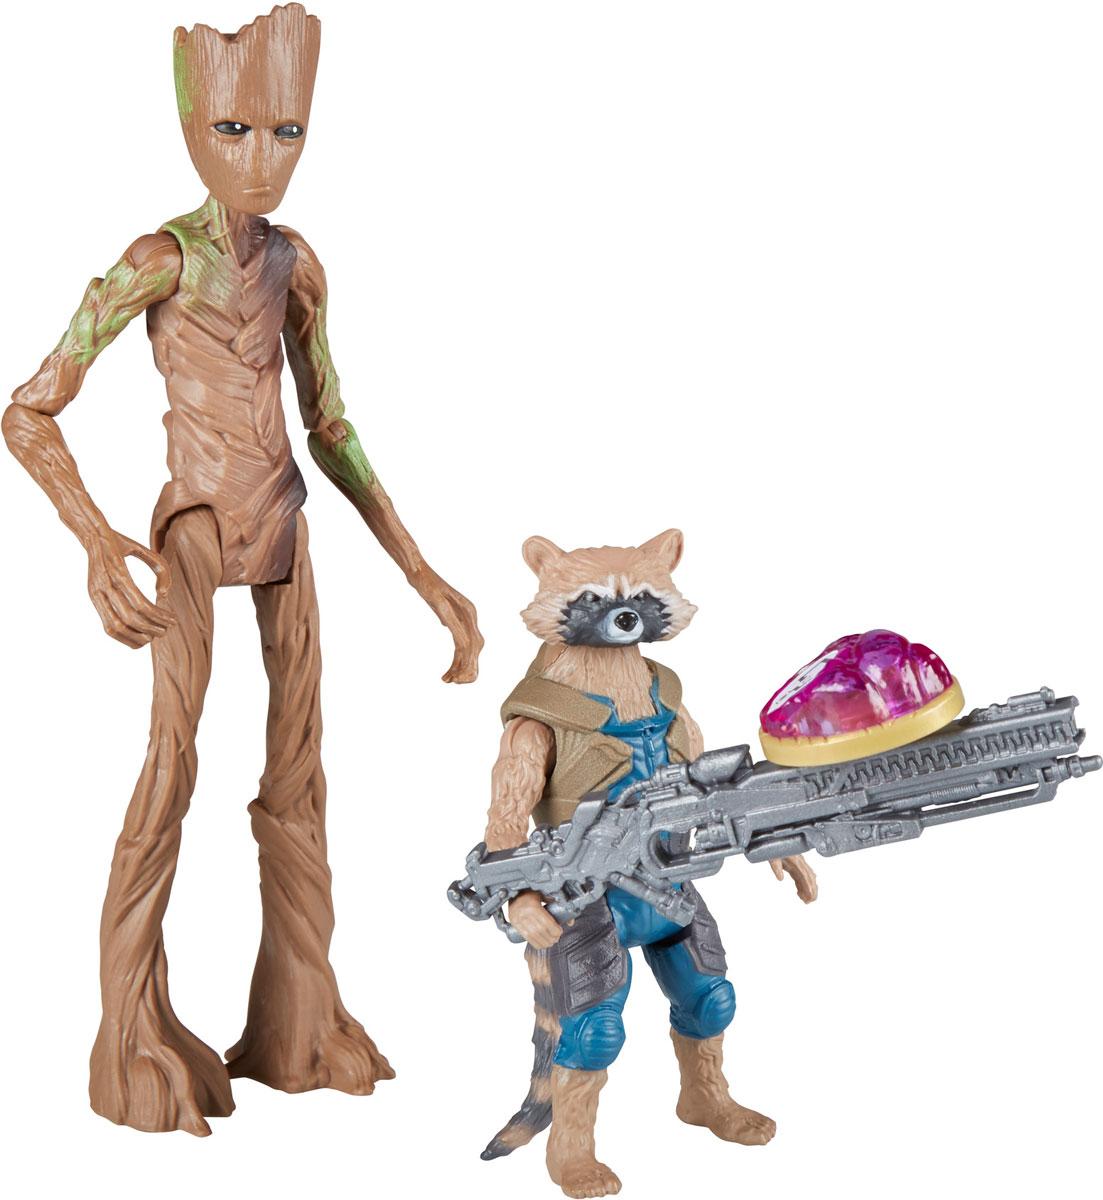 Avengers Набор фигурок Енот Ракета и Грут с камнем бесконечности avengers набор фигурок iron man